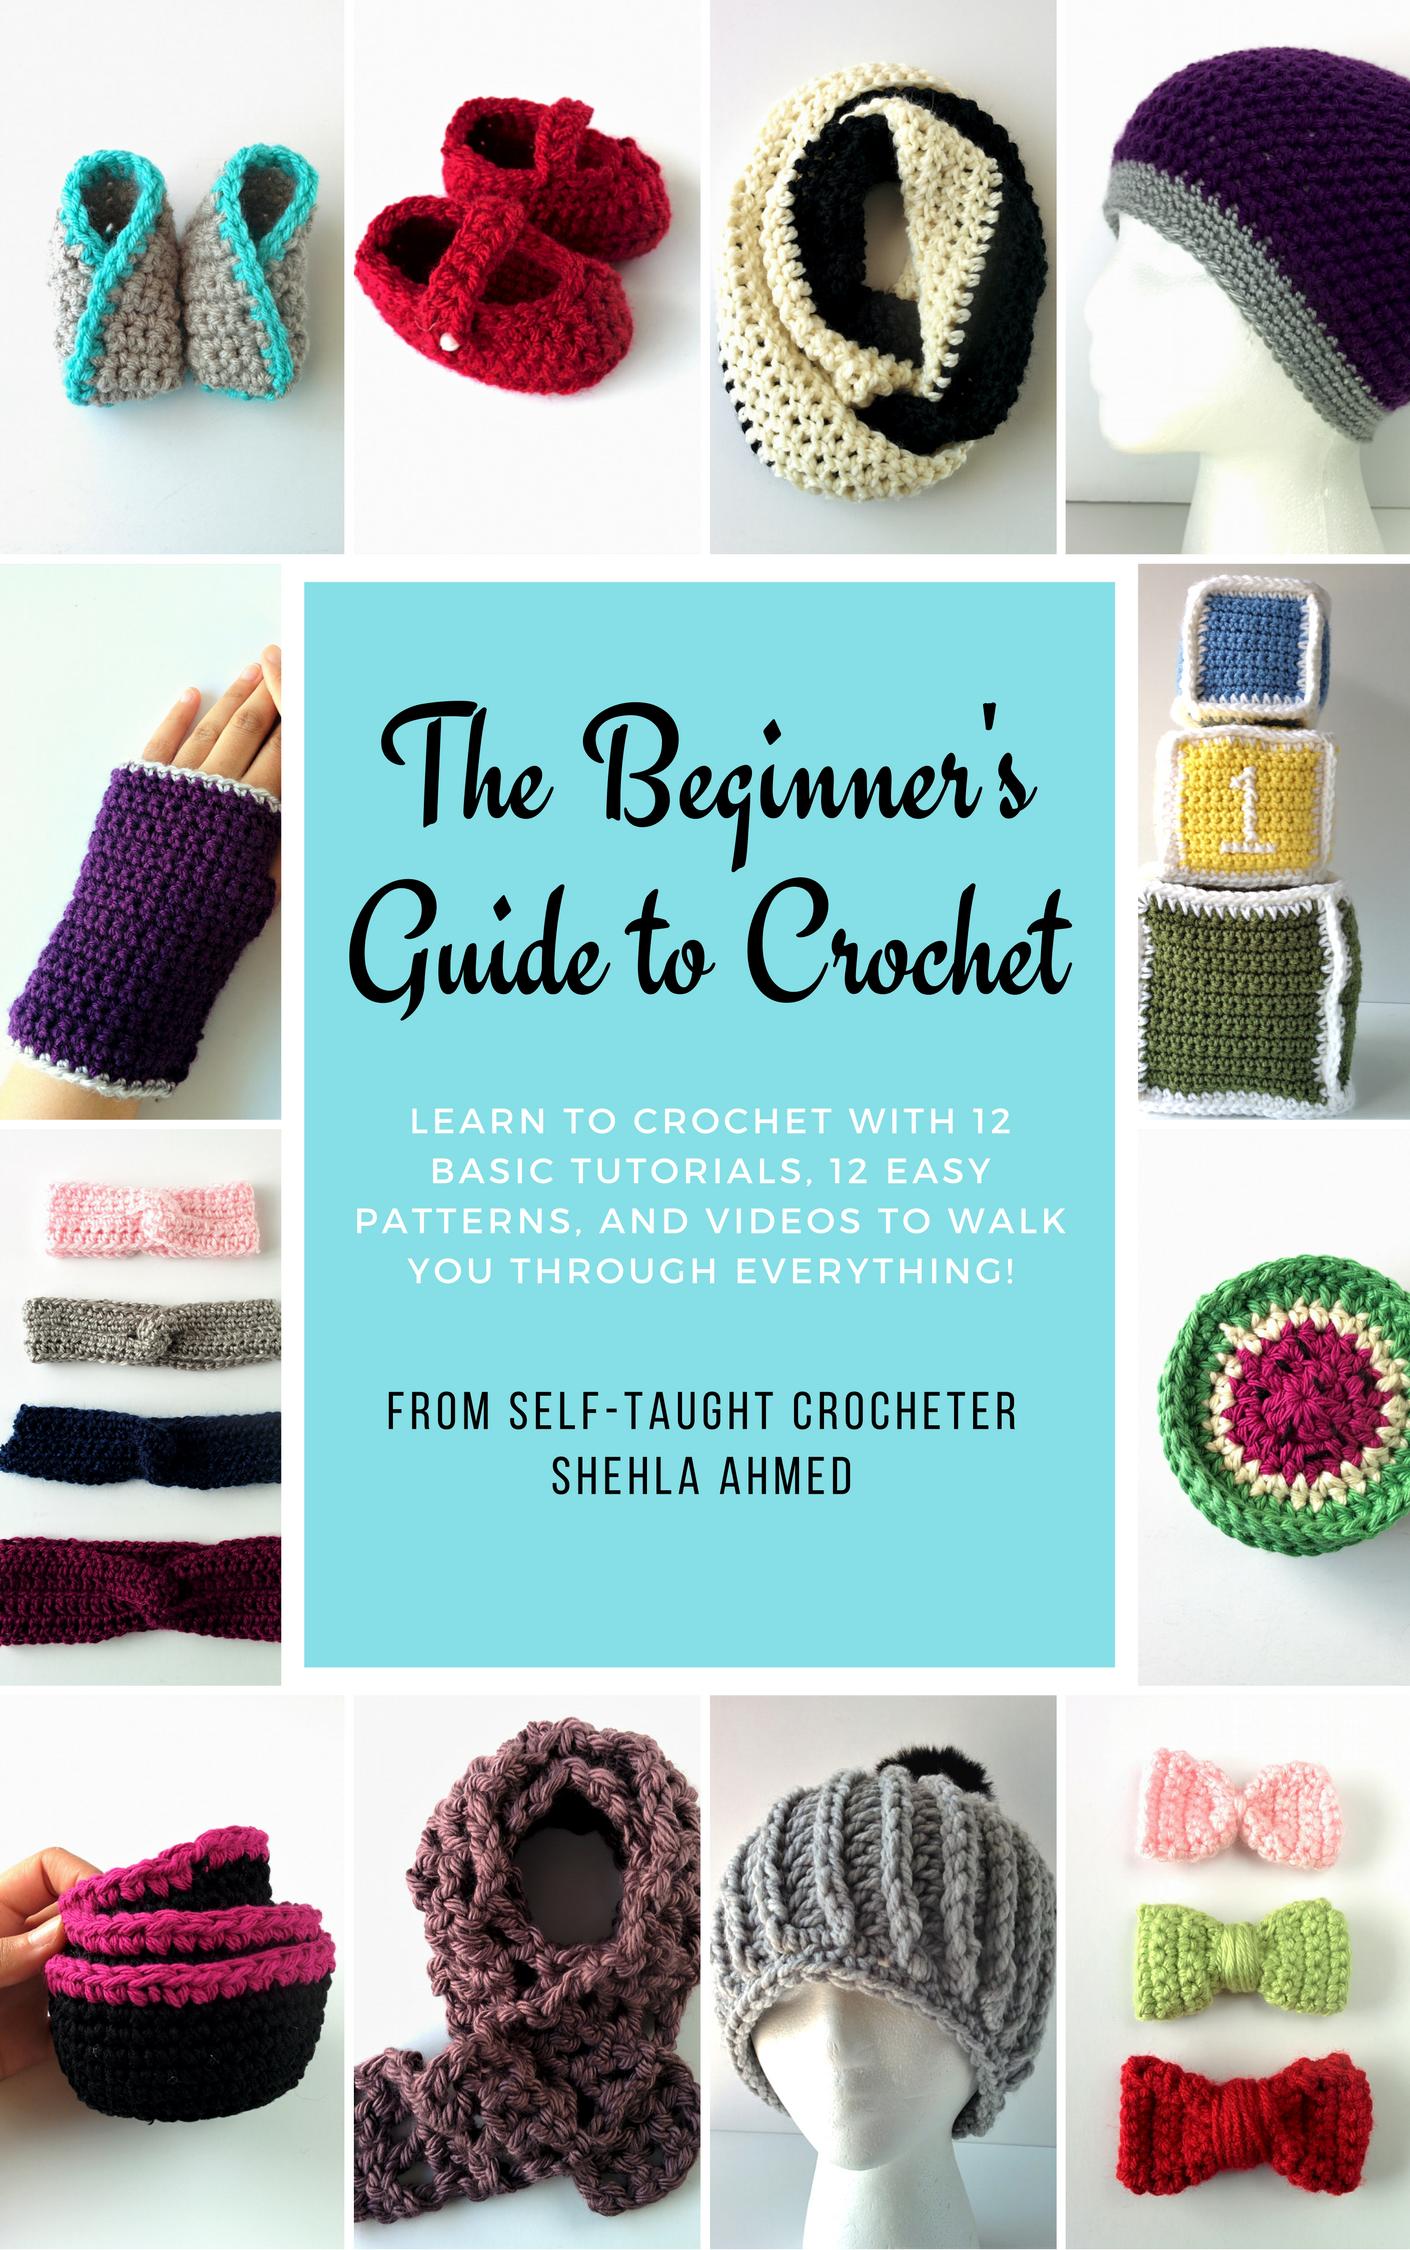 88583eaef 5 Things I Wish I Knew Before I Started Crocheting